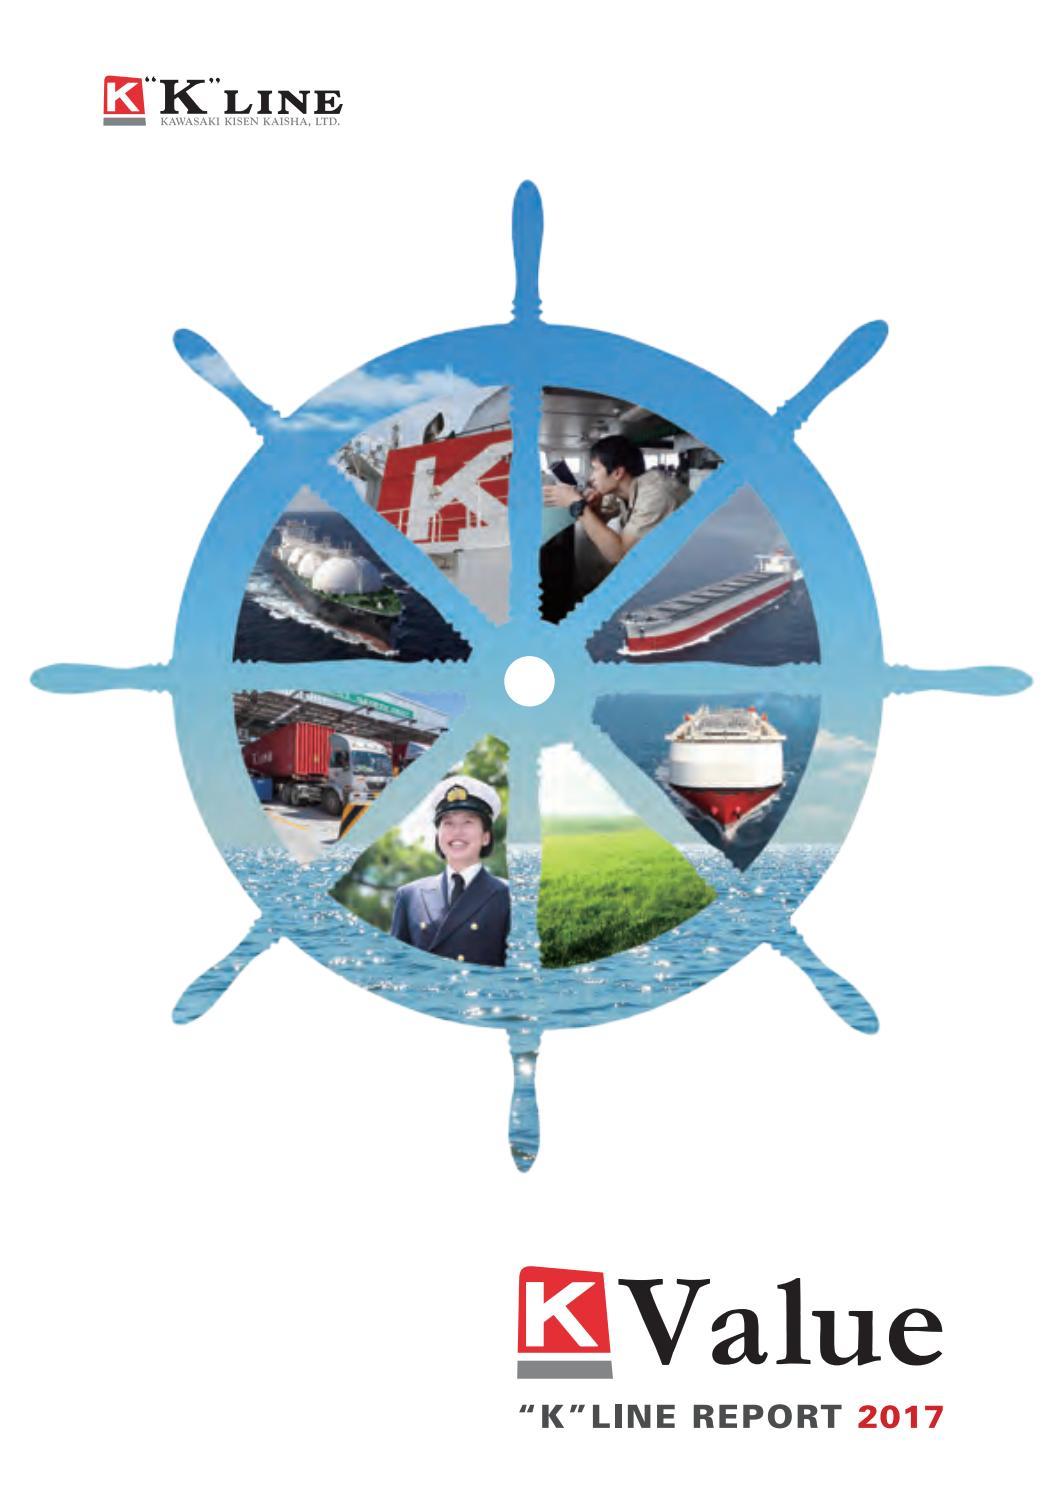 Klinereport2017 en by Maritime Professionals - issuu